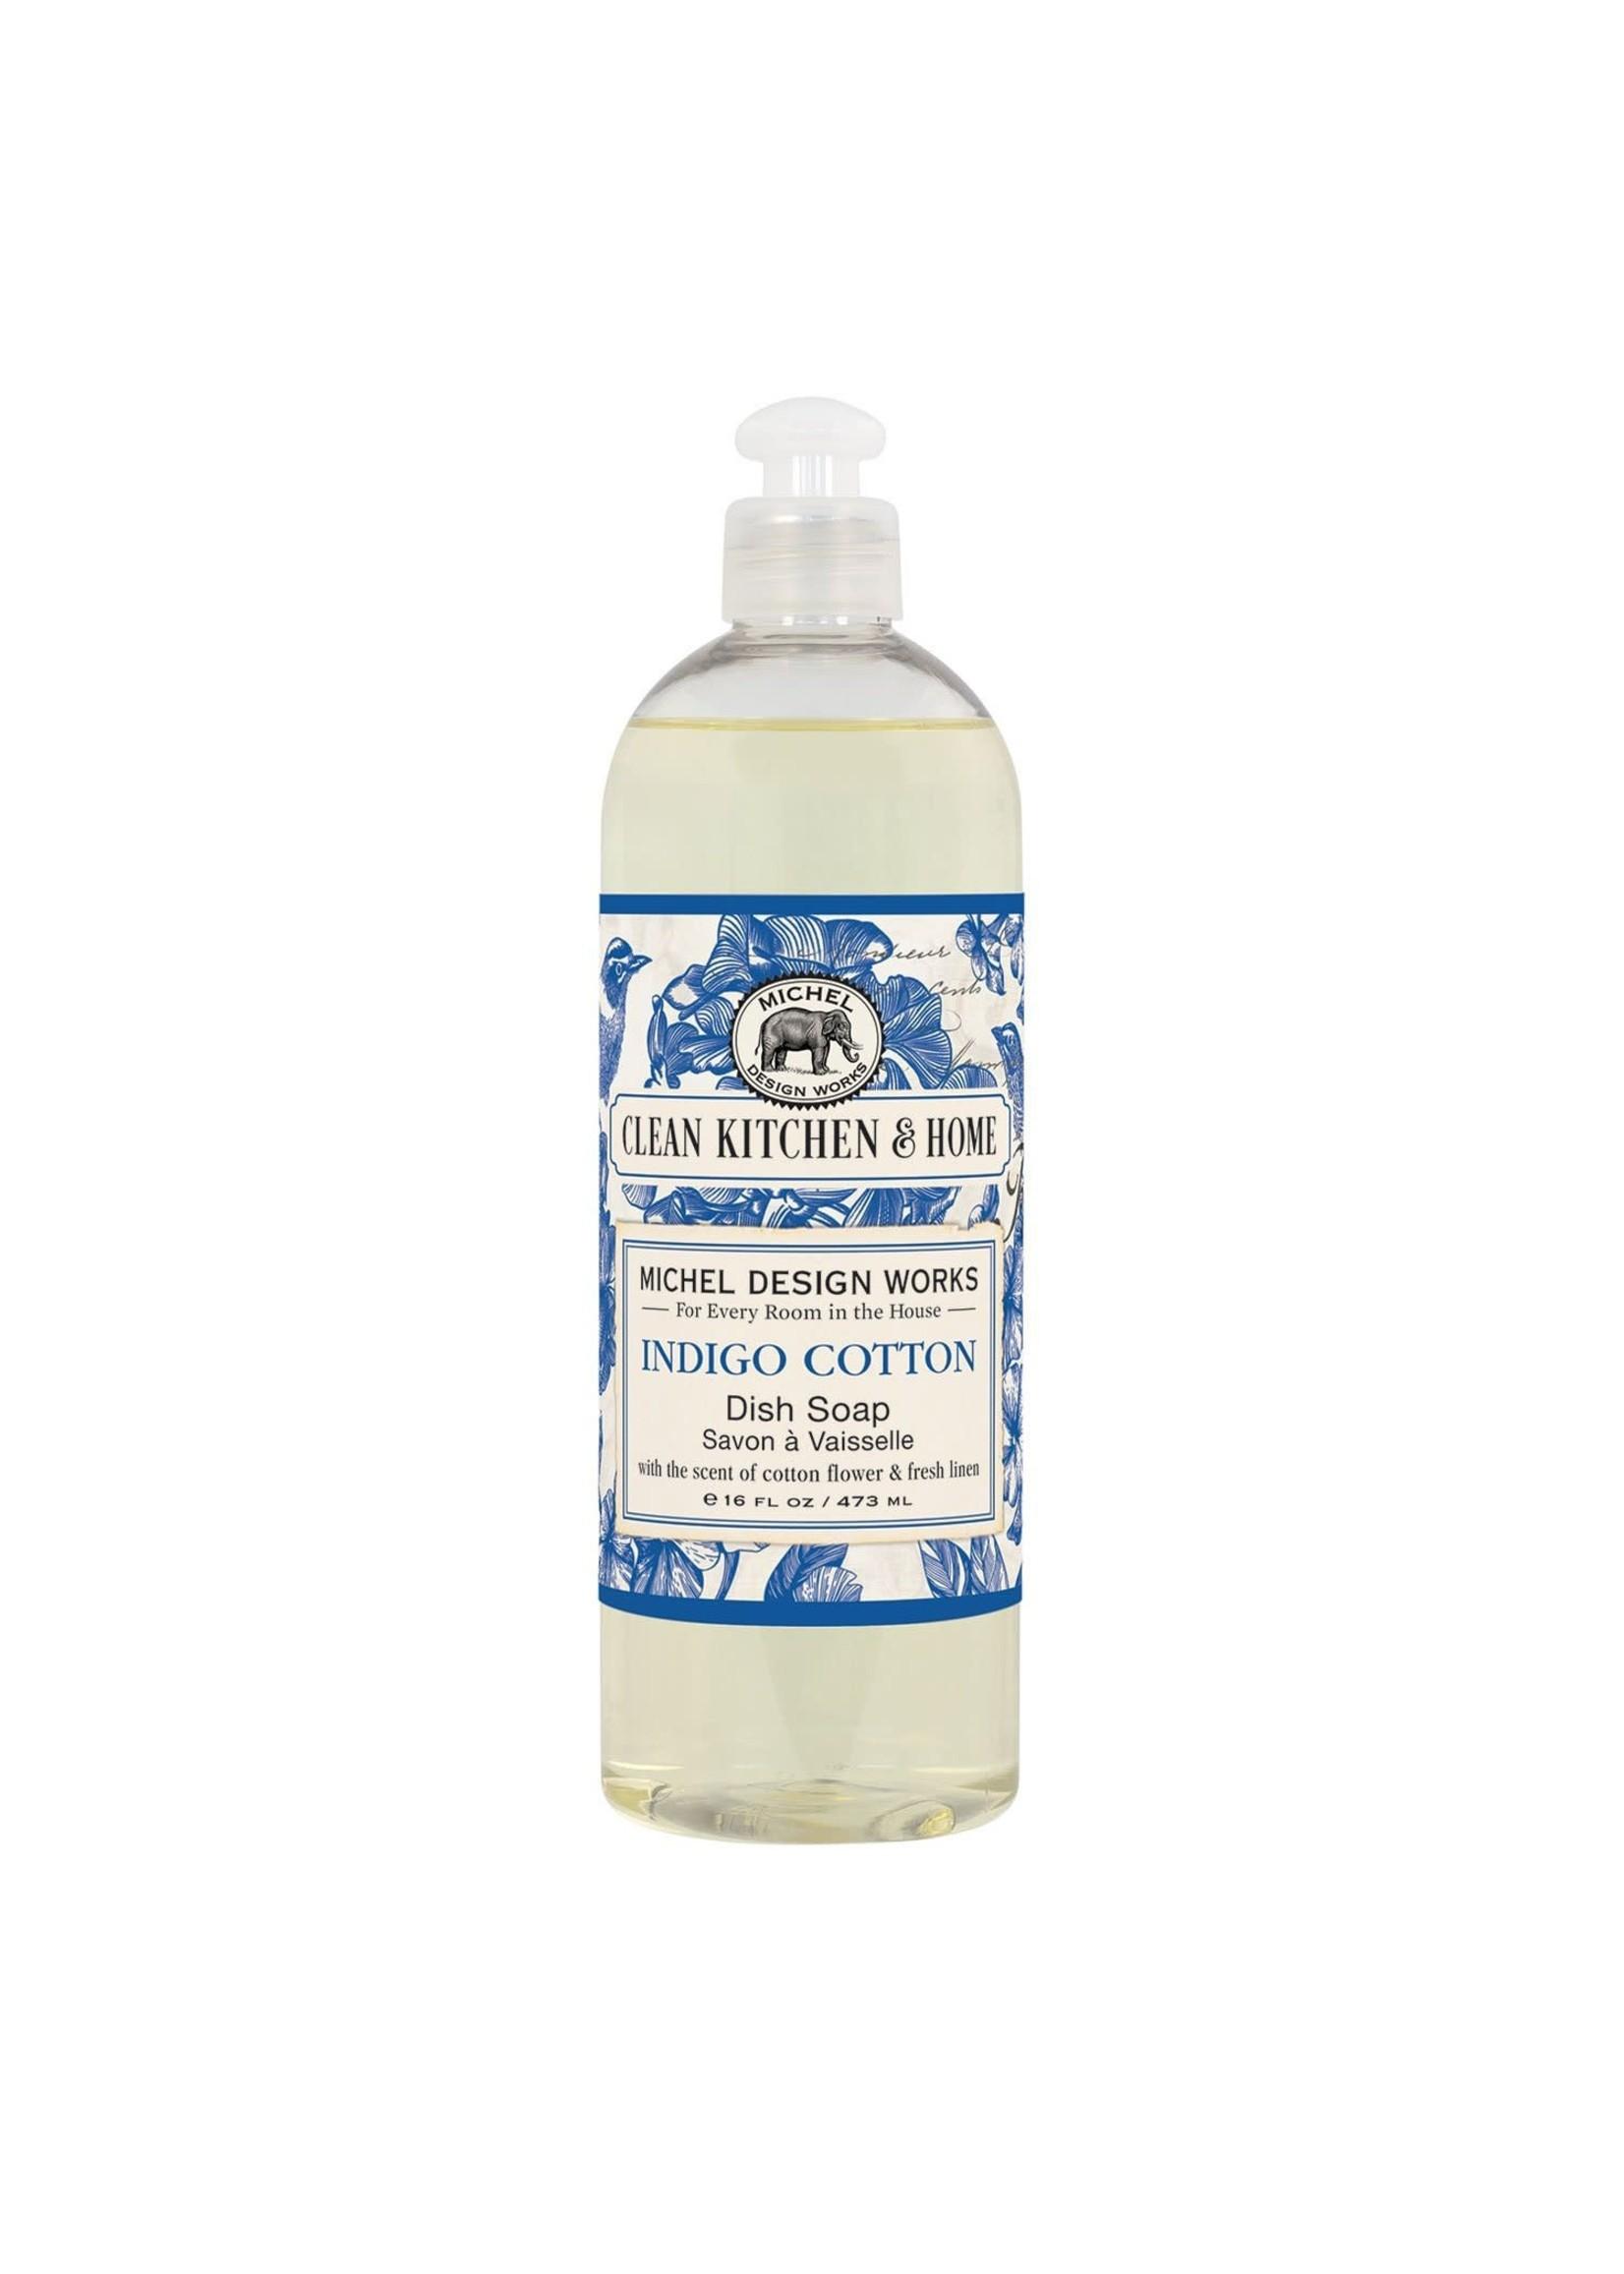 INDIGO COTTON DISH SOAP